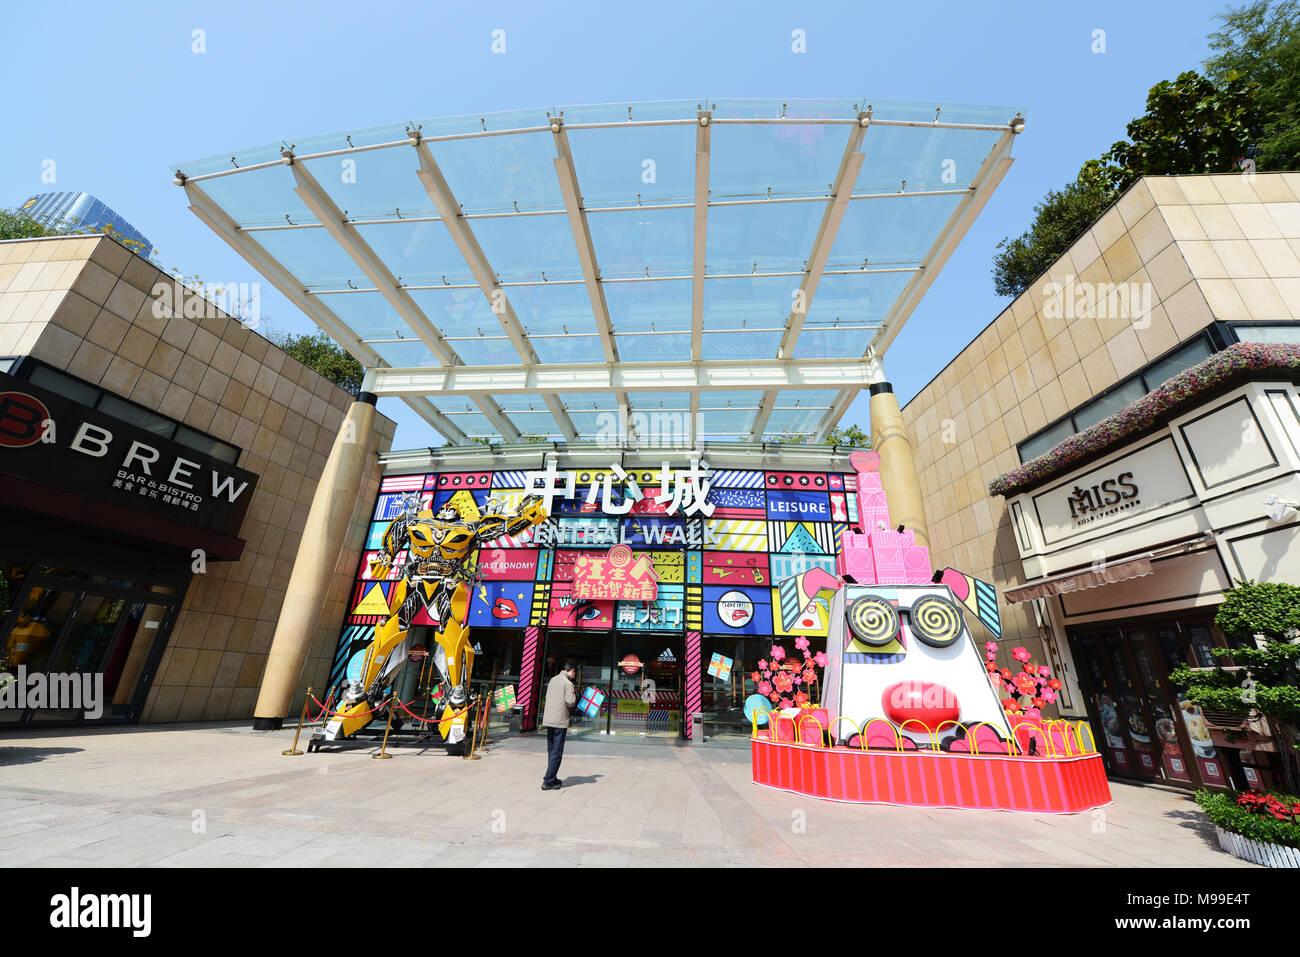 Central Walk shopping mall in Futian, Shenzhen. - Stock Image